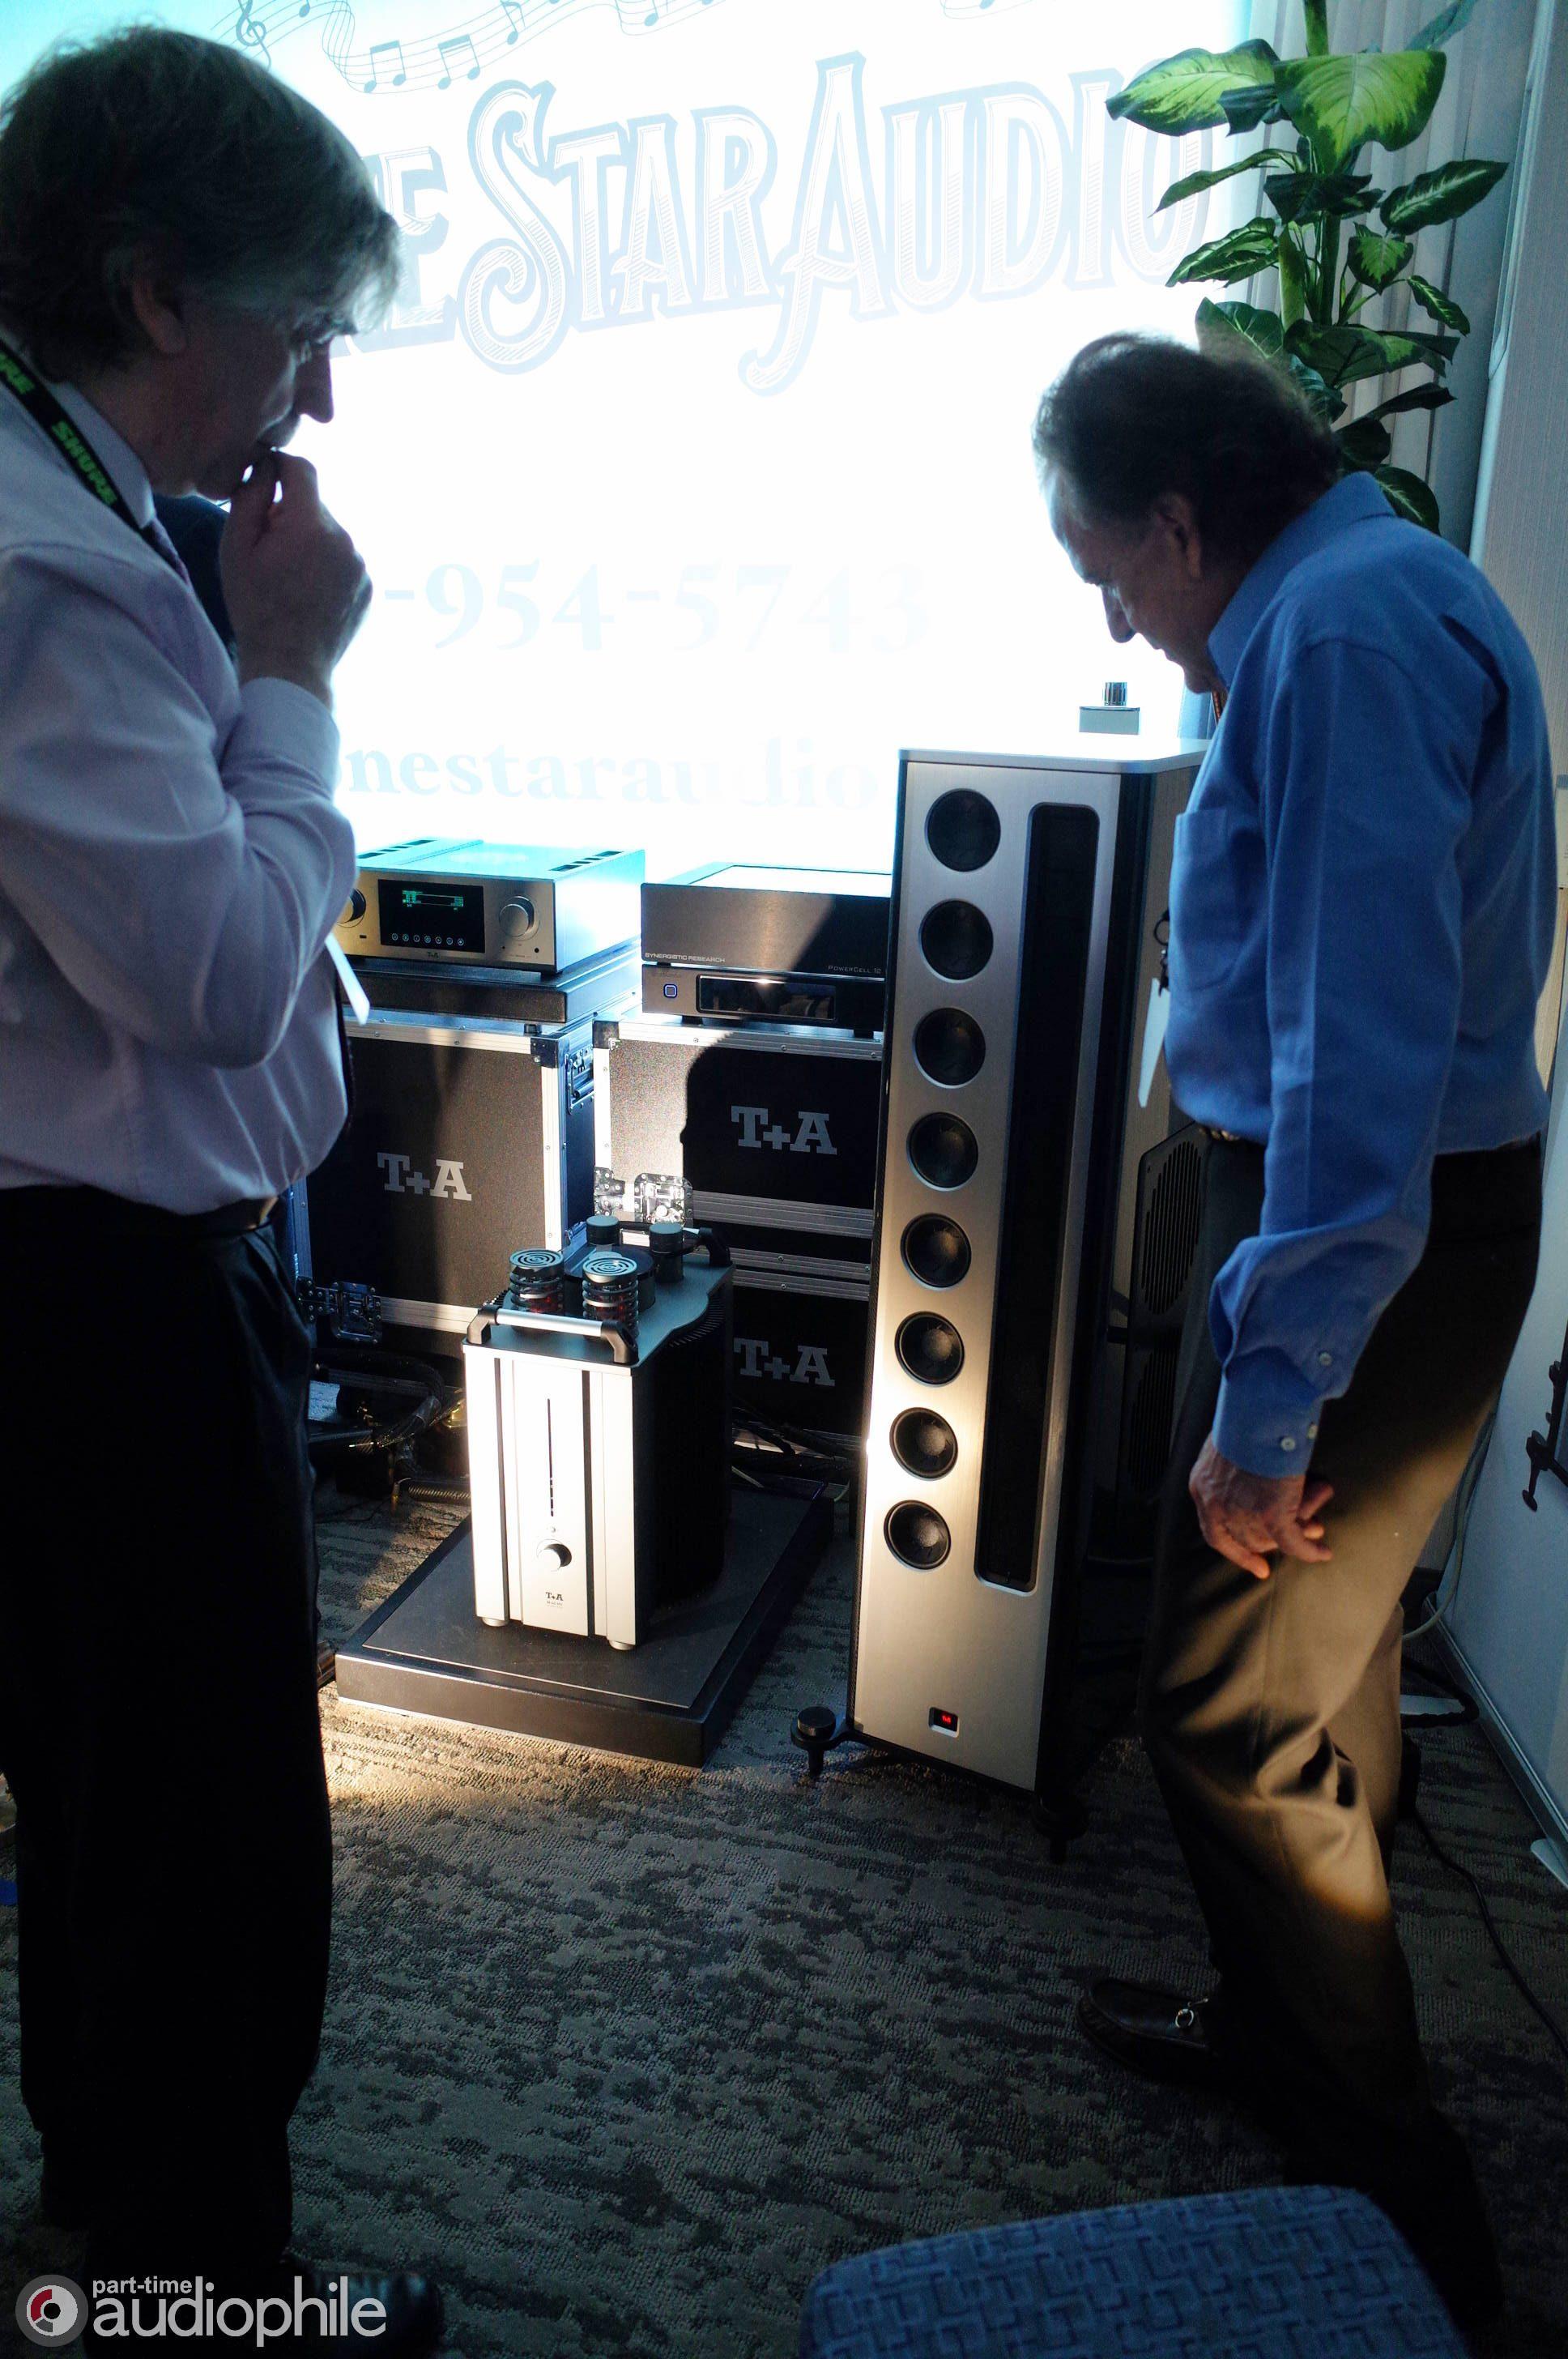 Lonestar Audio, T+A Elektroakustik, and Synergistic Research